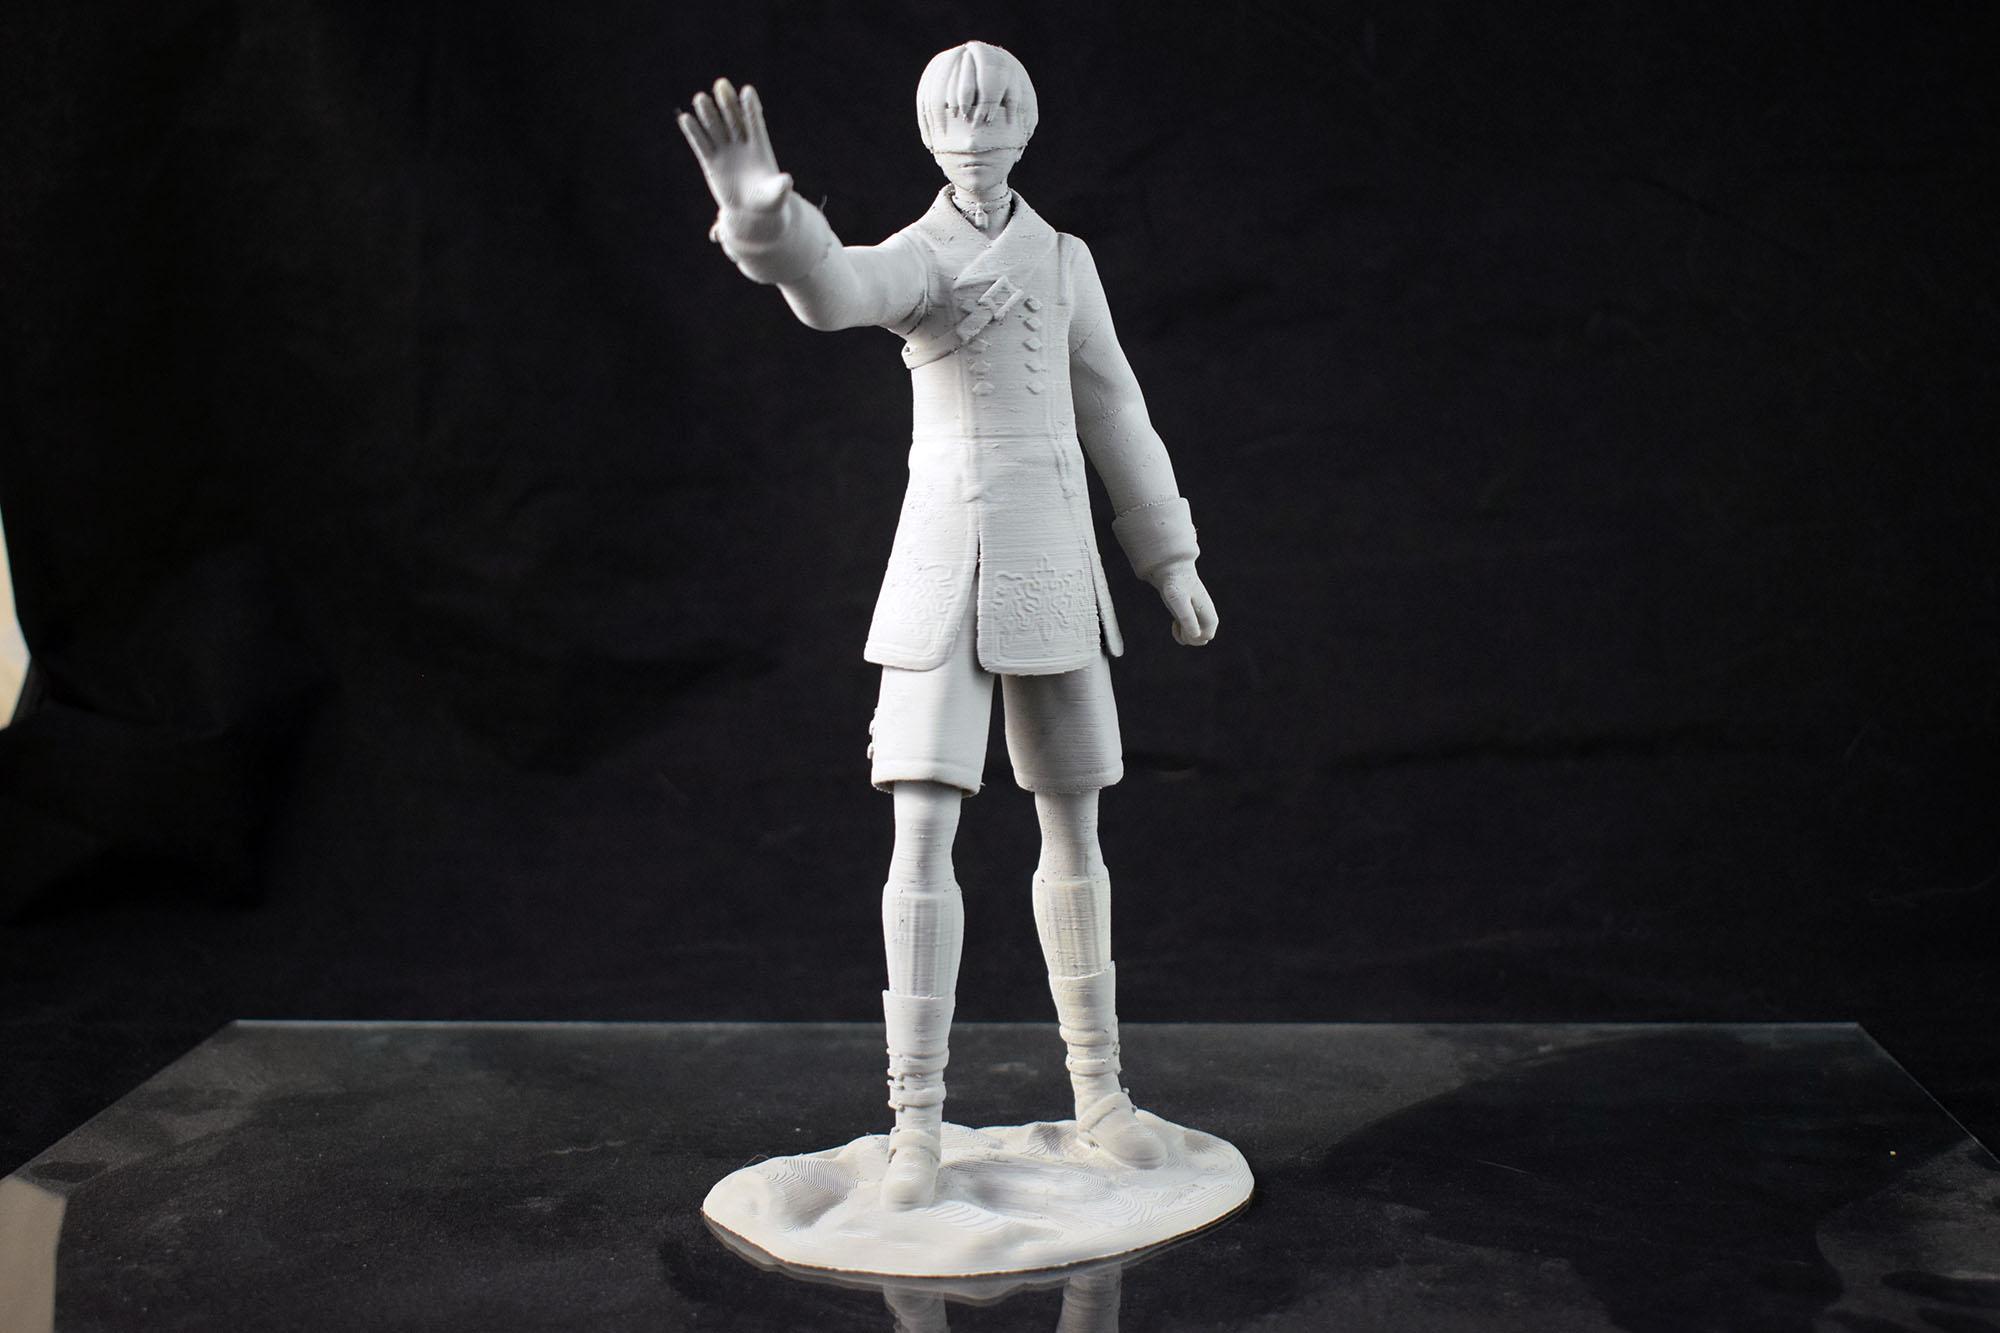 Nier Automata 9S 3D Print Model From Tanya Wiesner